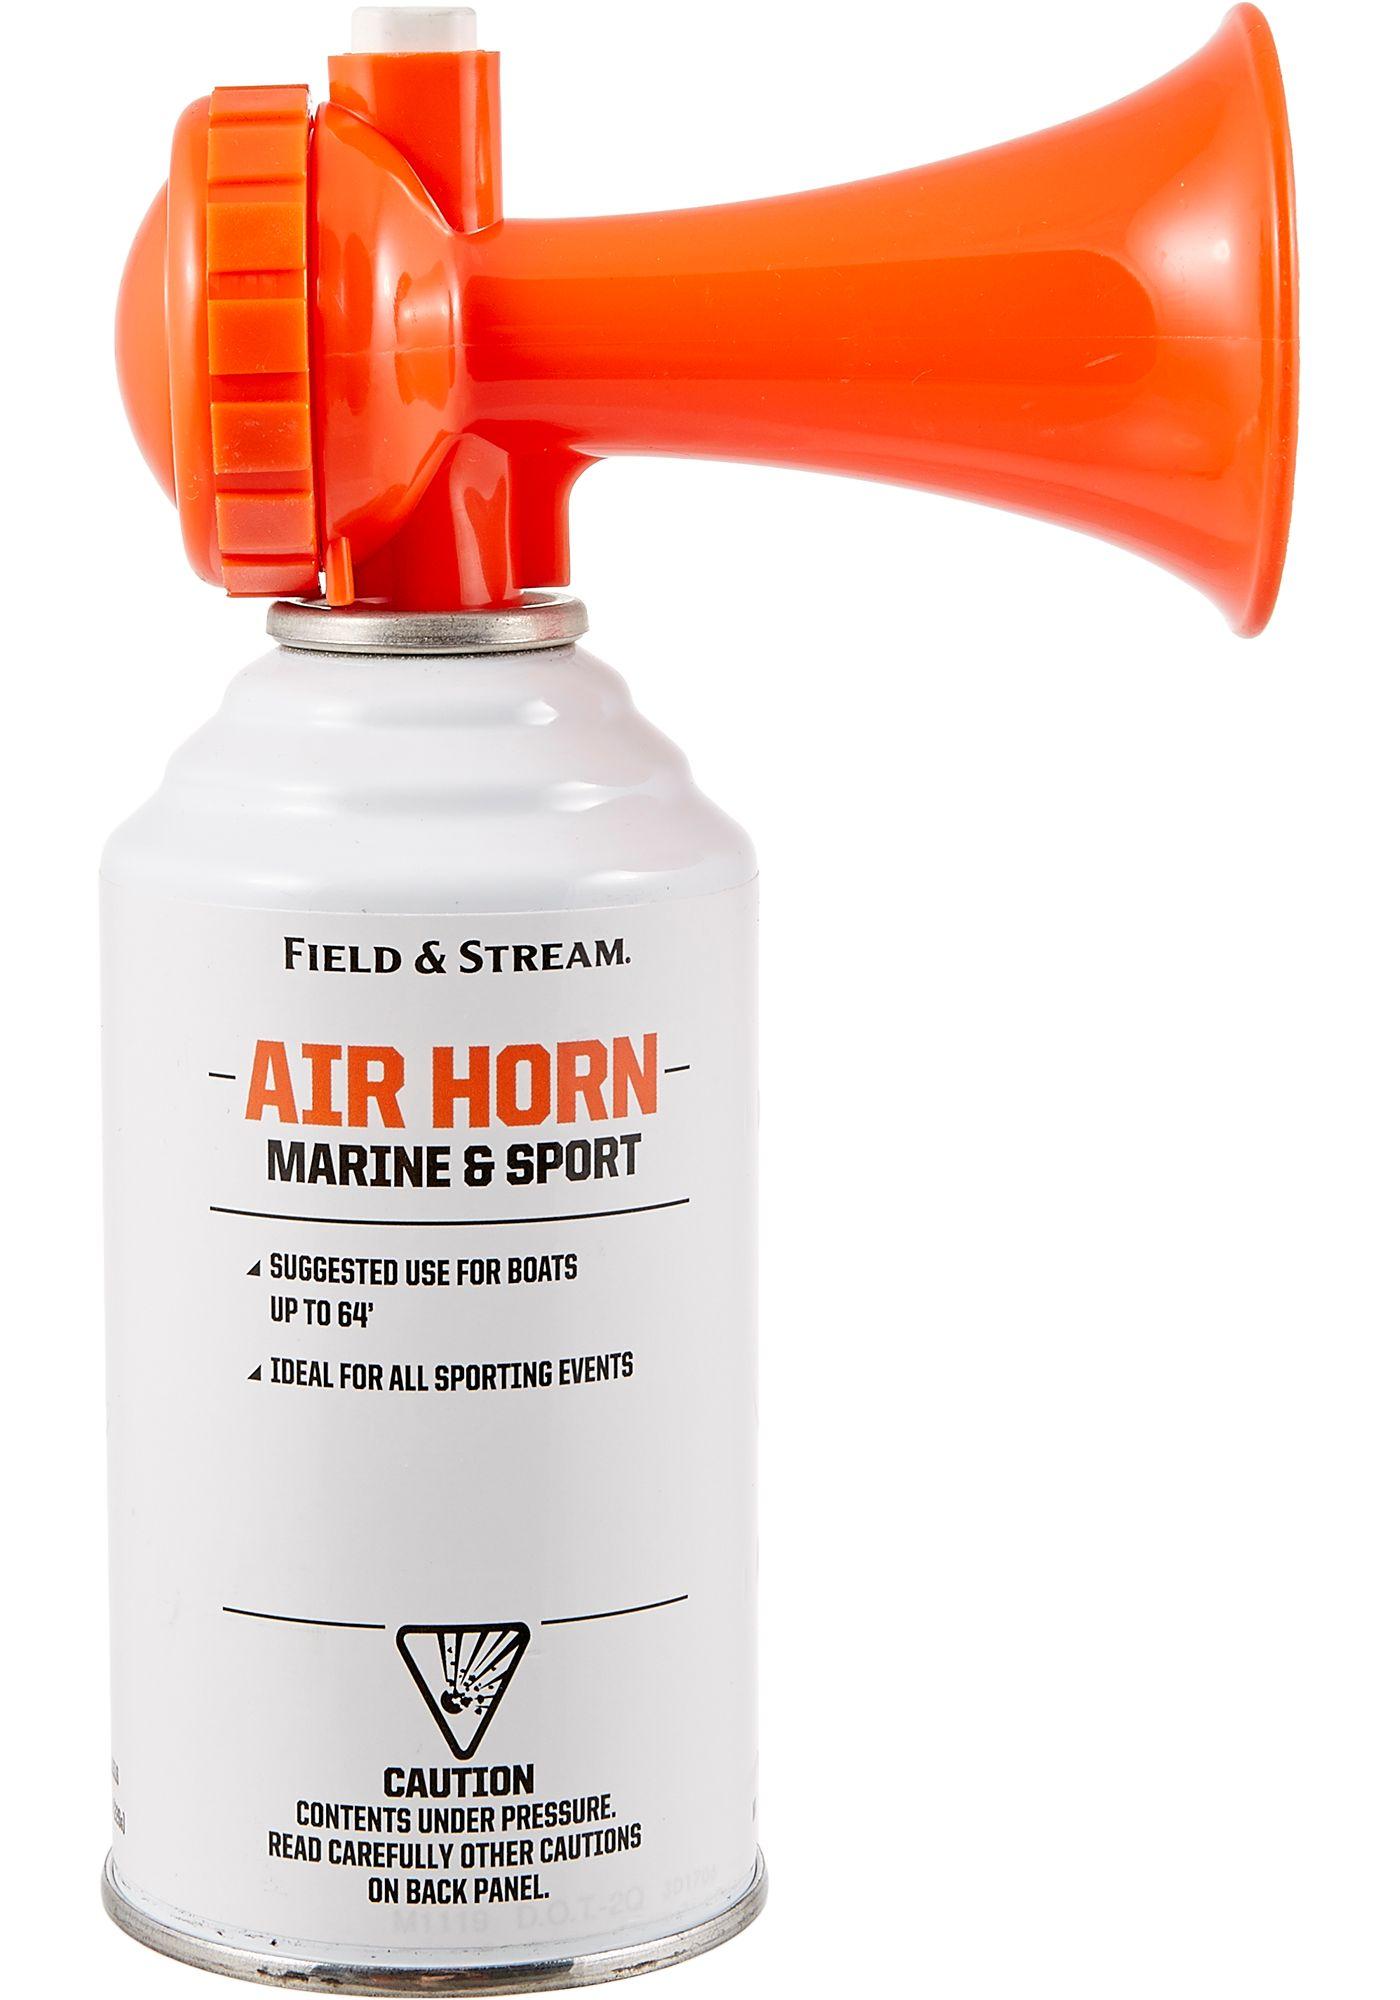 Field & Stream Marine & Sport Large Air Horn